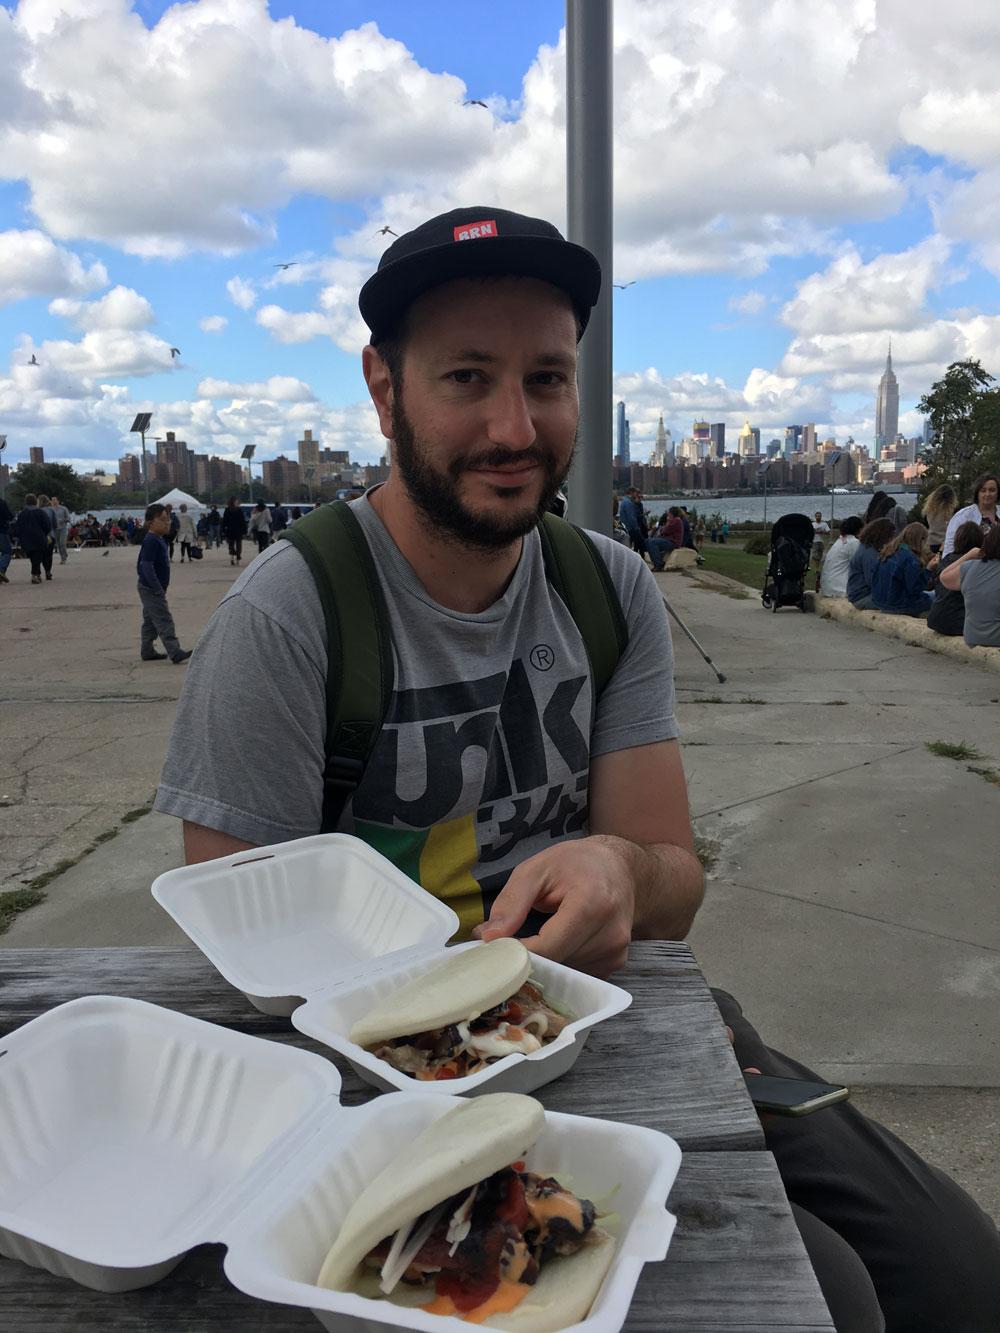 nyc-food5.jpg